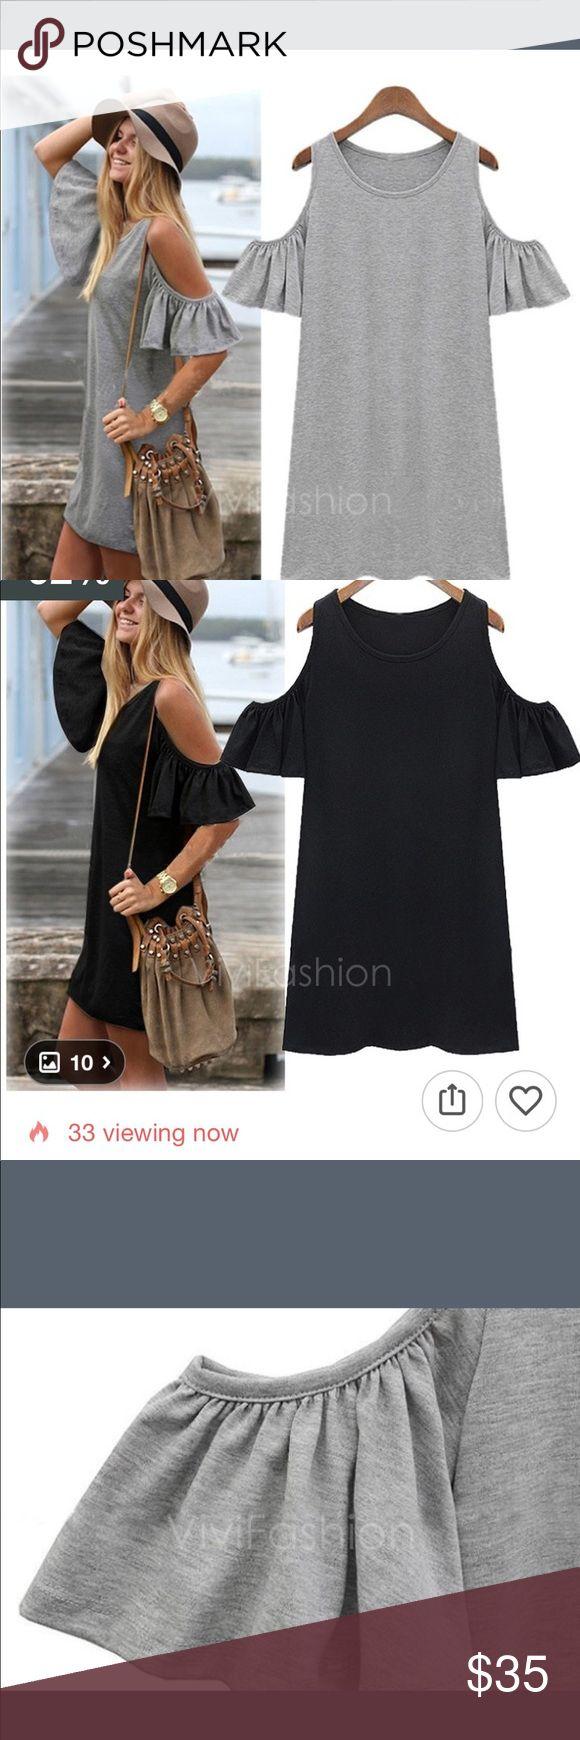 Cute Dress in Black or grey! w/ Butterfly sleeves Grey or black mini dress w/ butterfly sleeve. maymay's boutique Dresses Mini